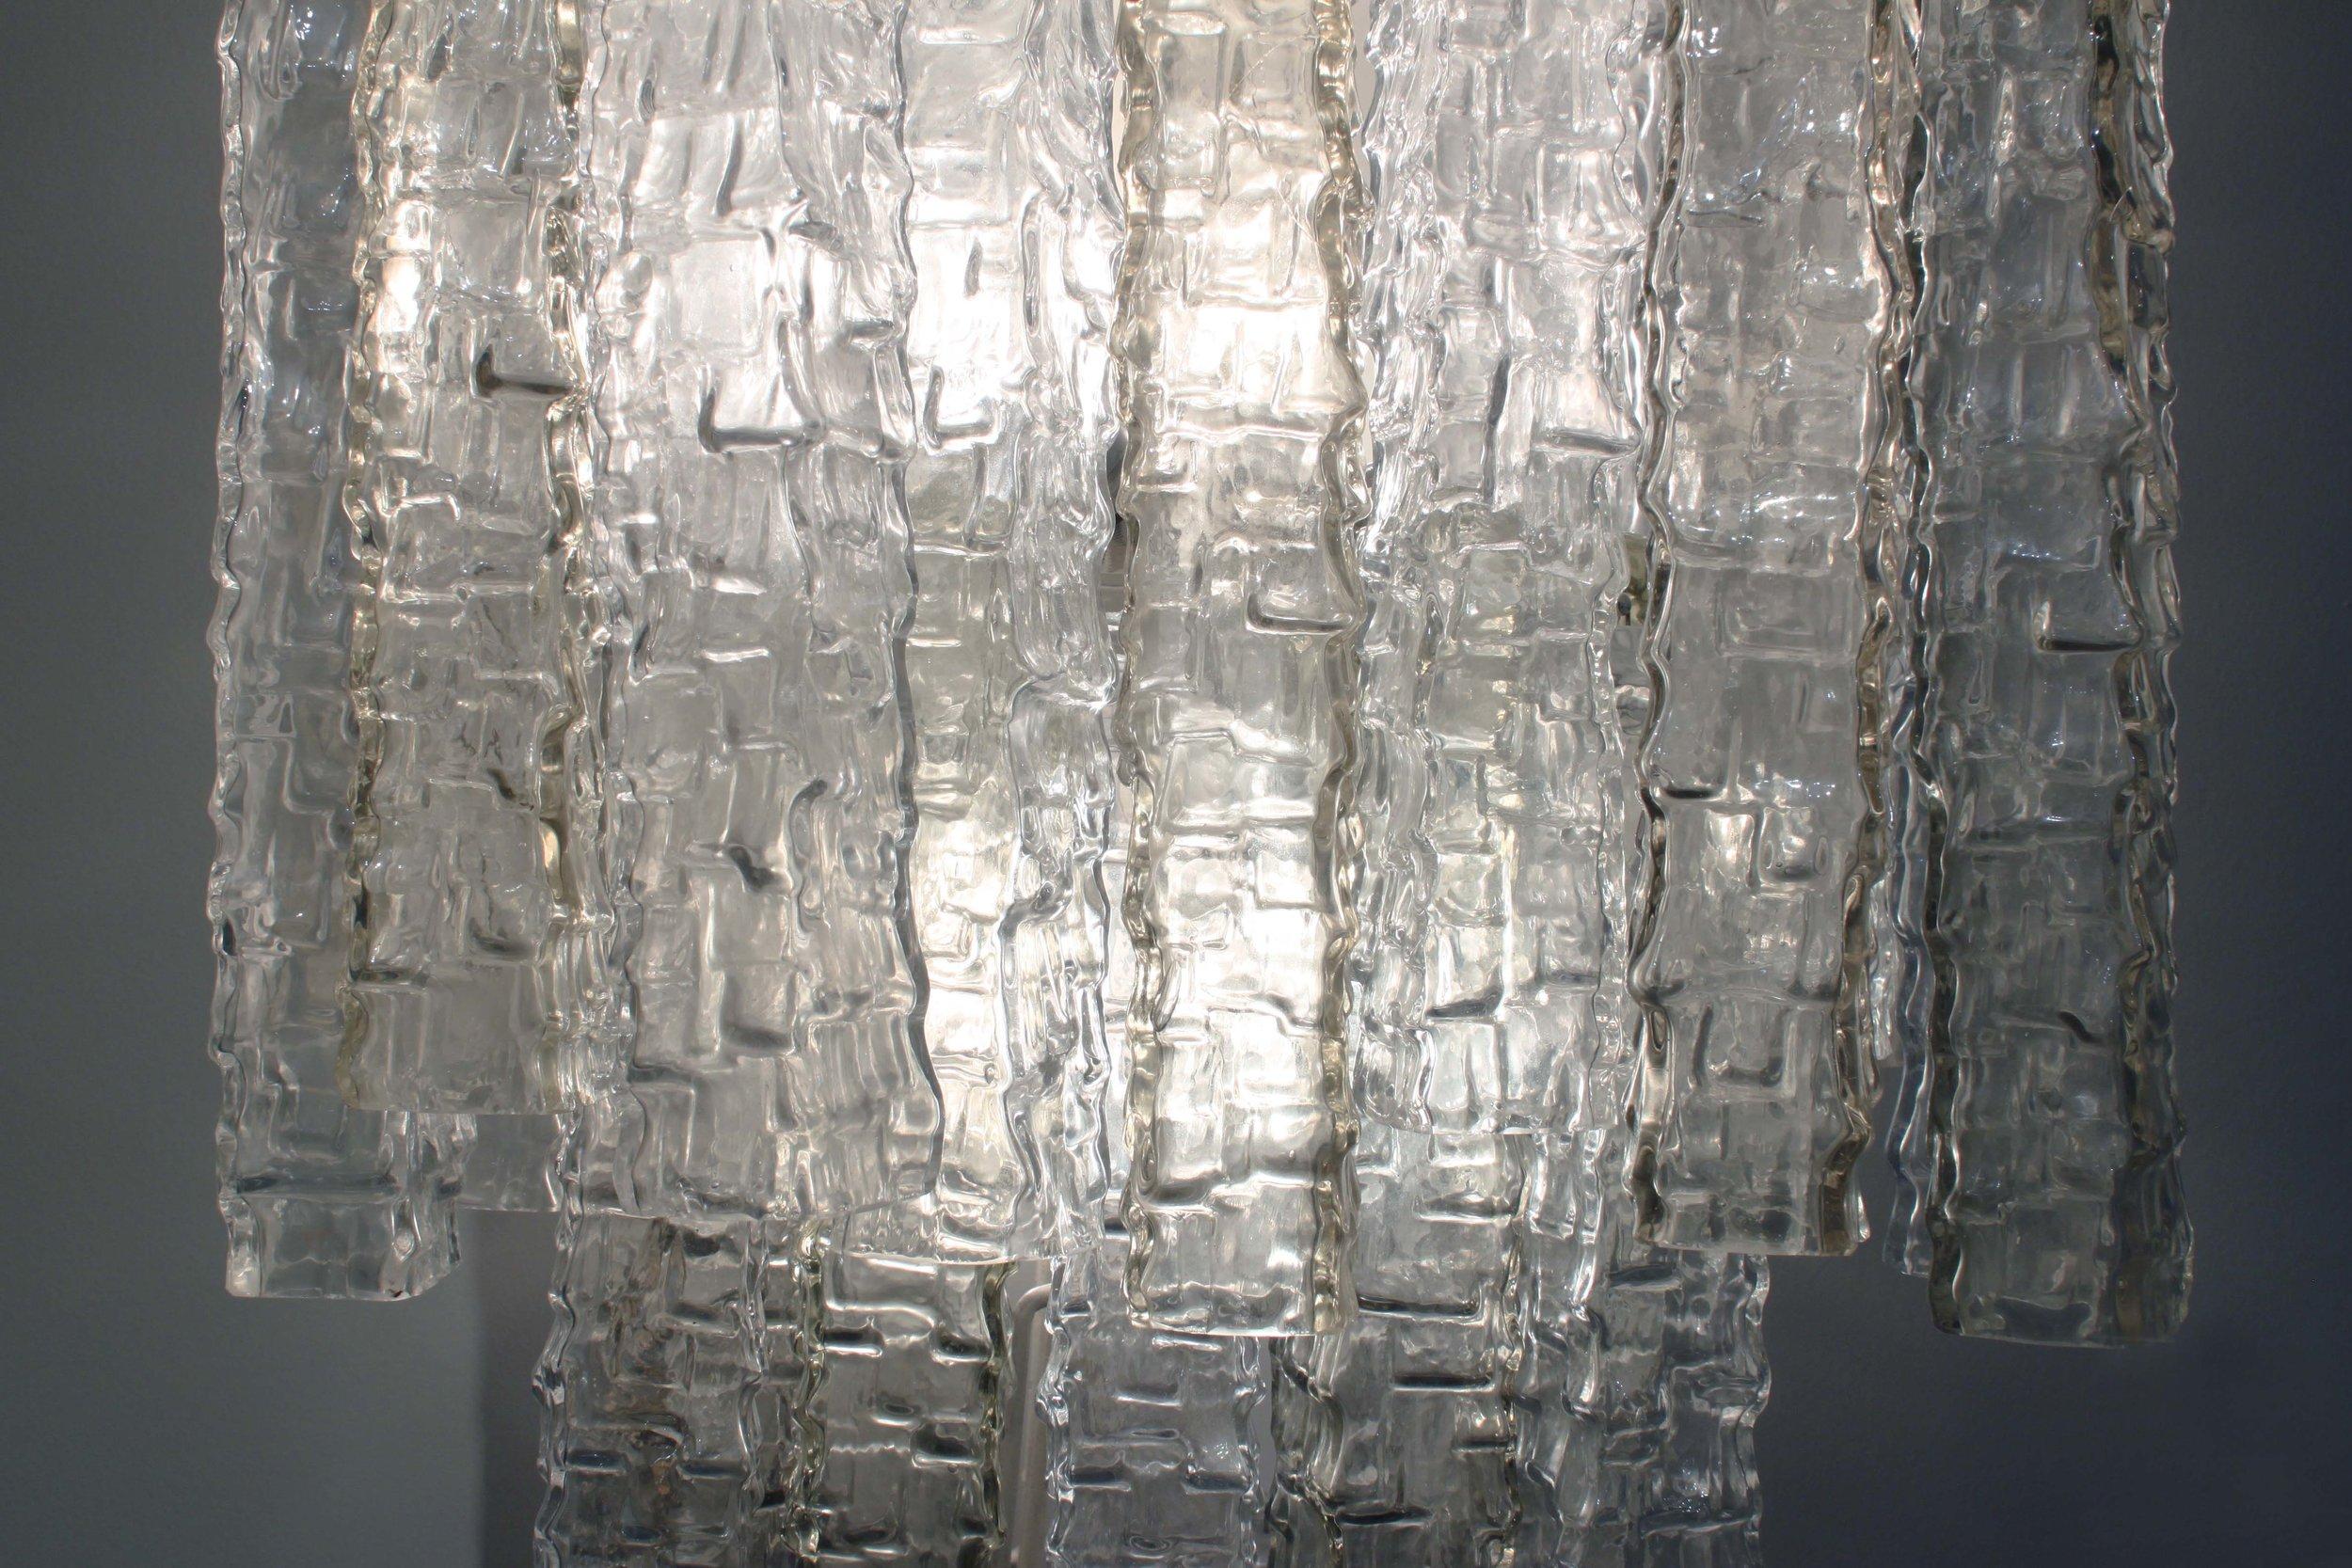 Venini 85 monumental sqr tubes sconce28 detail light on hires hires.jpg